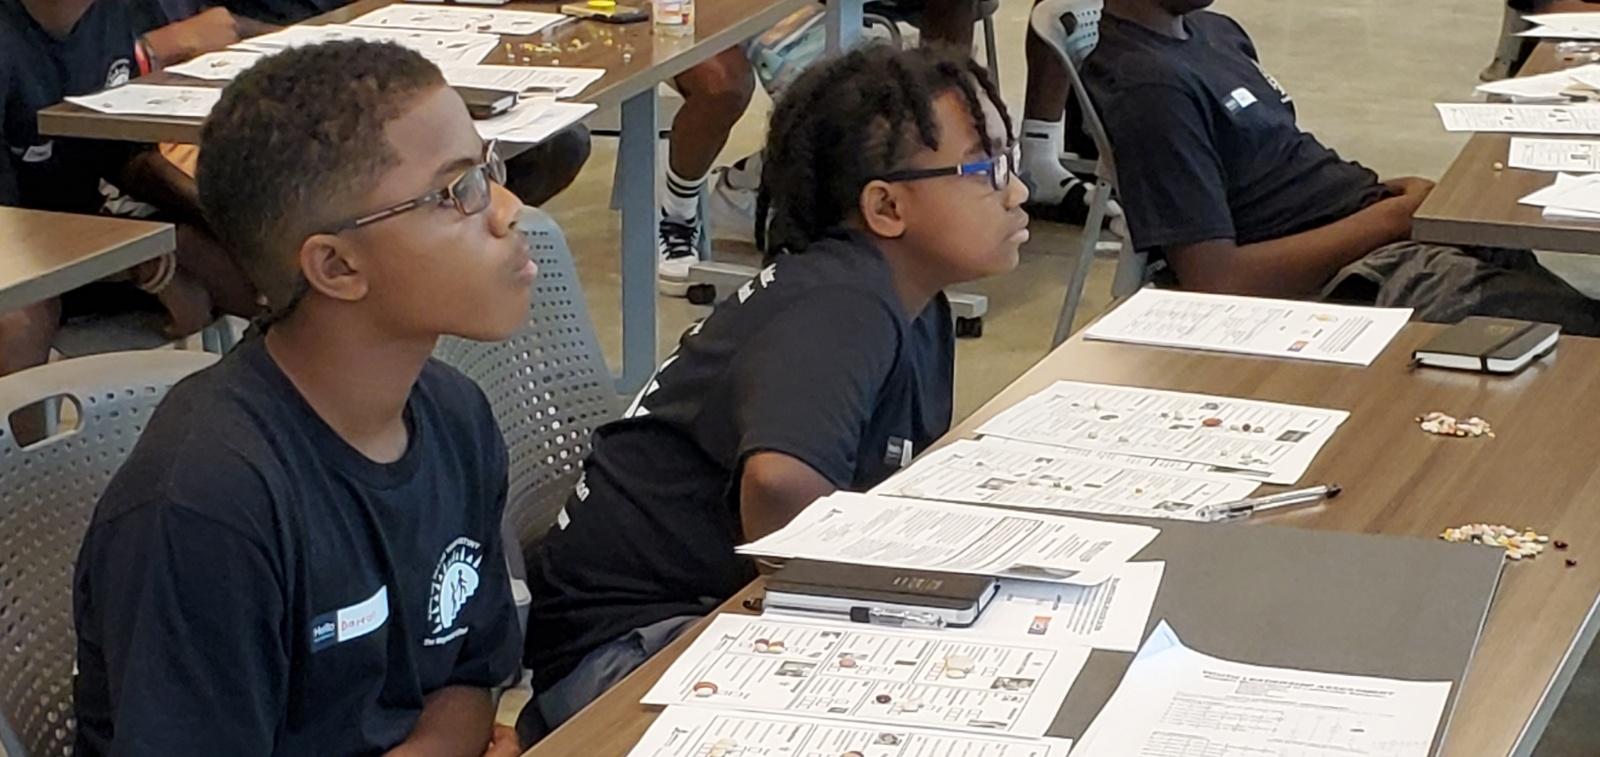 2021 Boys Leadership Institute - The Maynard 4 Foundation 06